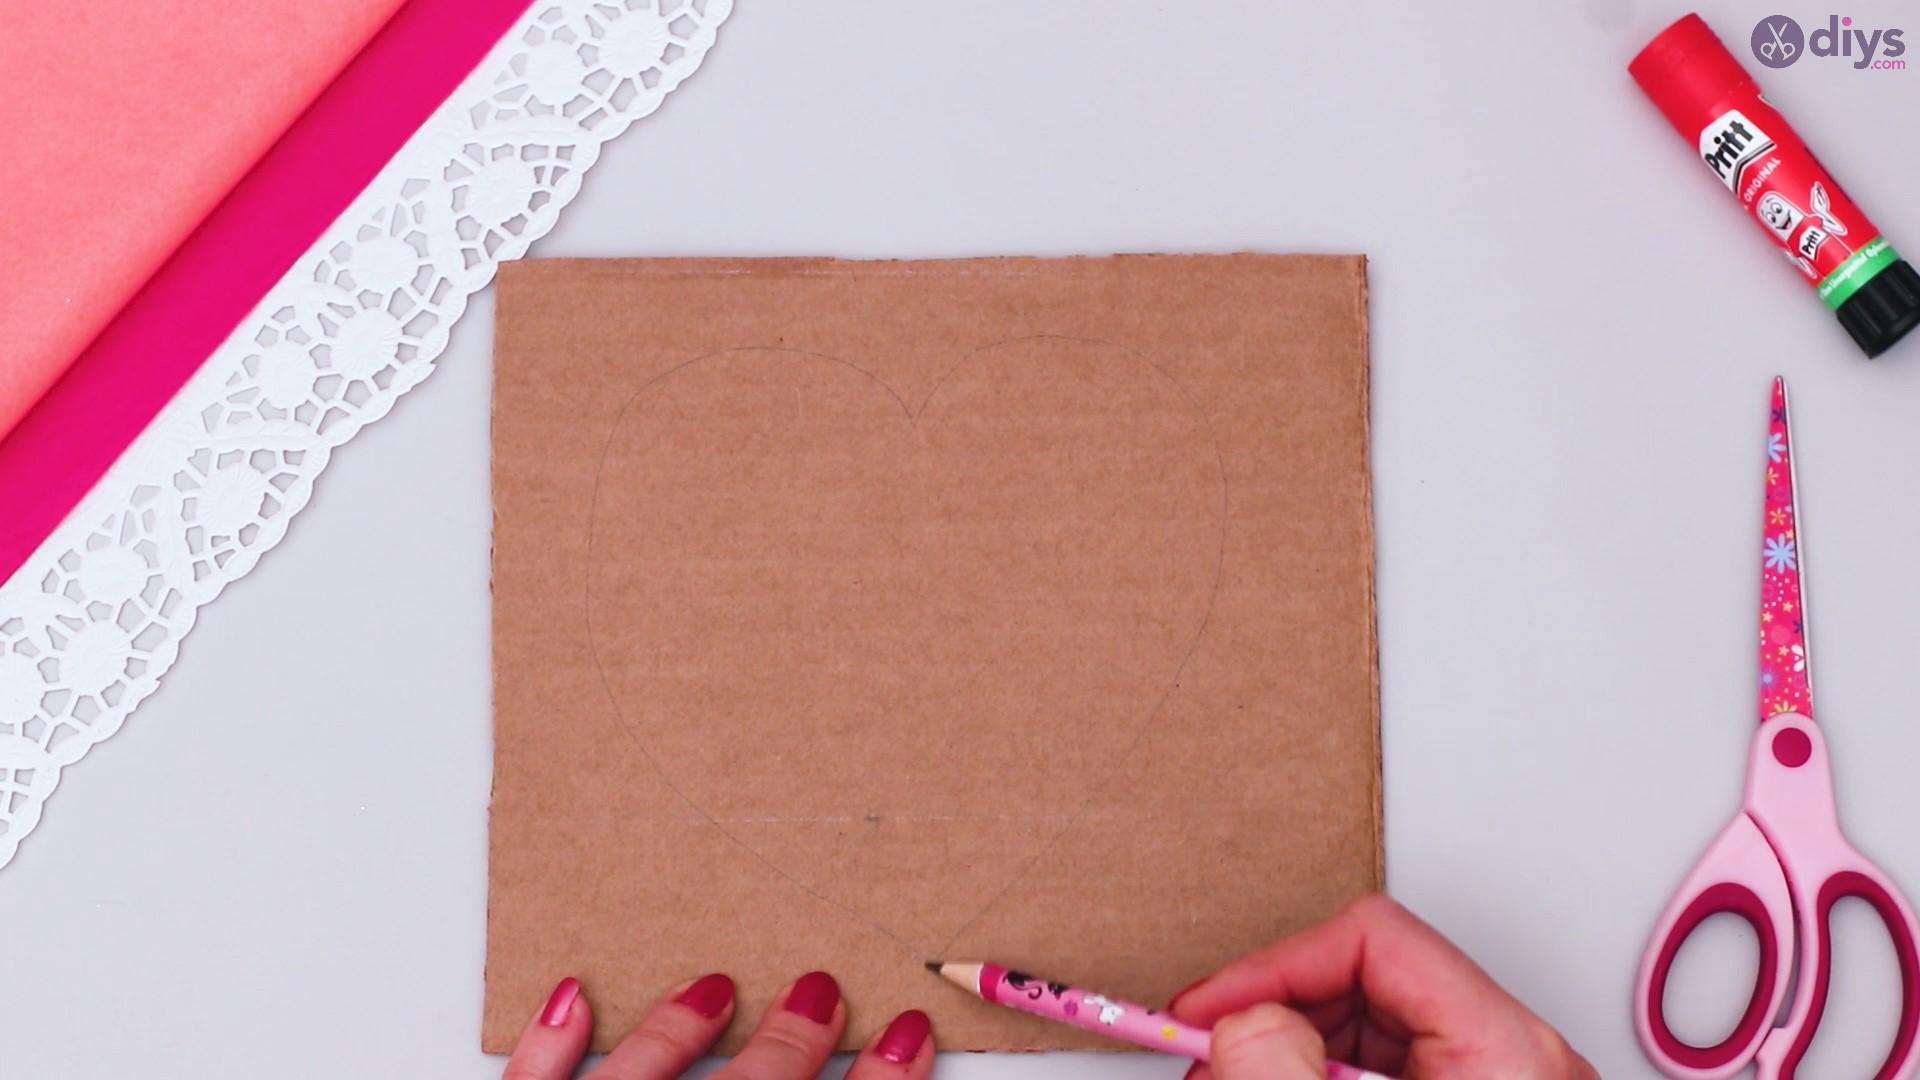 Diy tissue paper puffy heart step 1 (1)